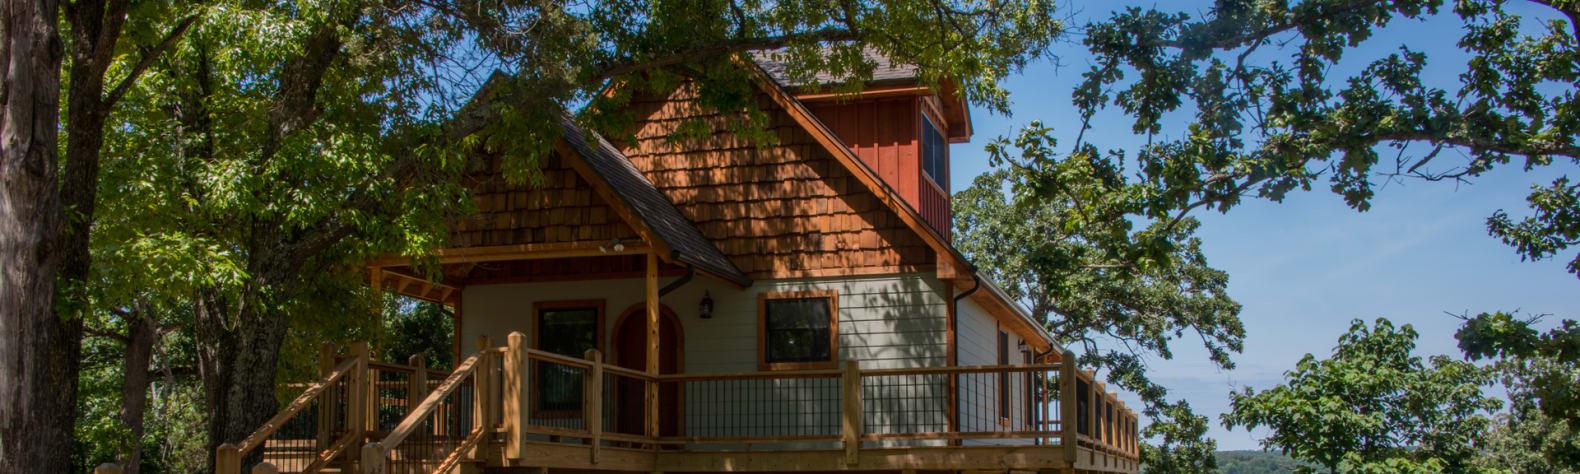 Arrowhead Ridge Treehouse